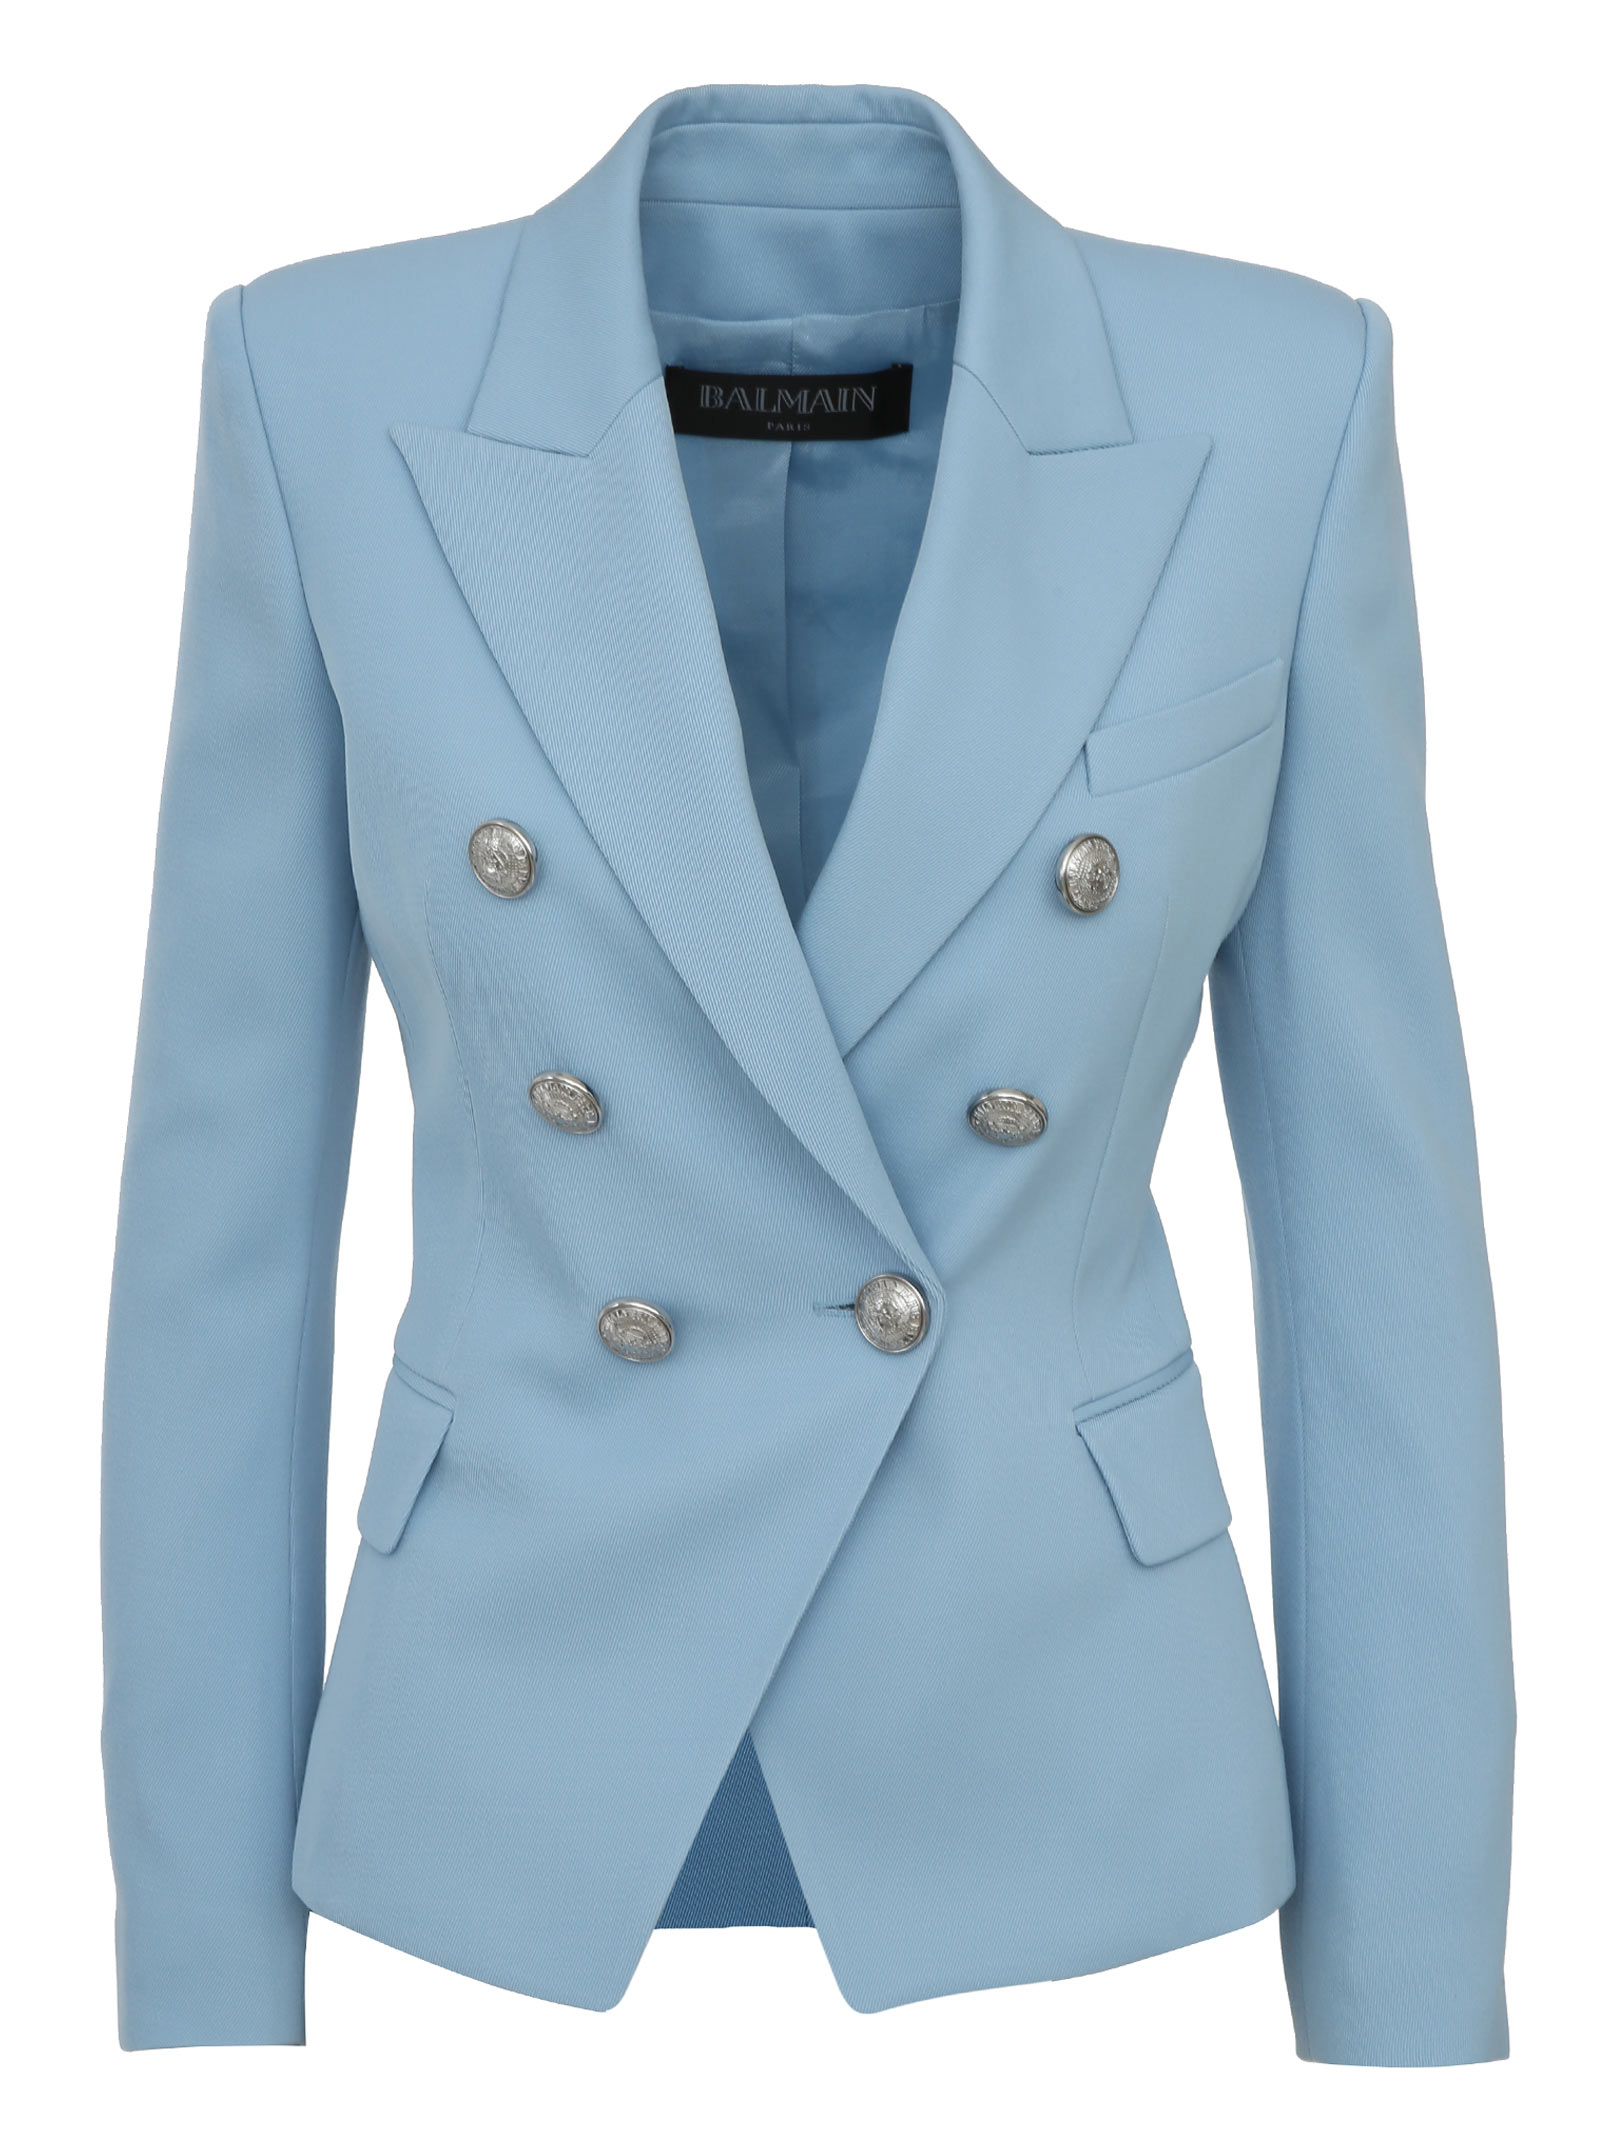 24986bb9d25 BALMAIN PARIS. Light blue *ICON double-breasted wool blazer ...